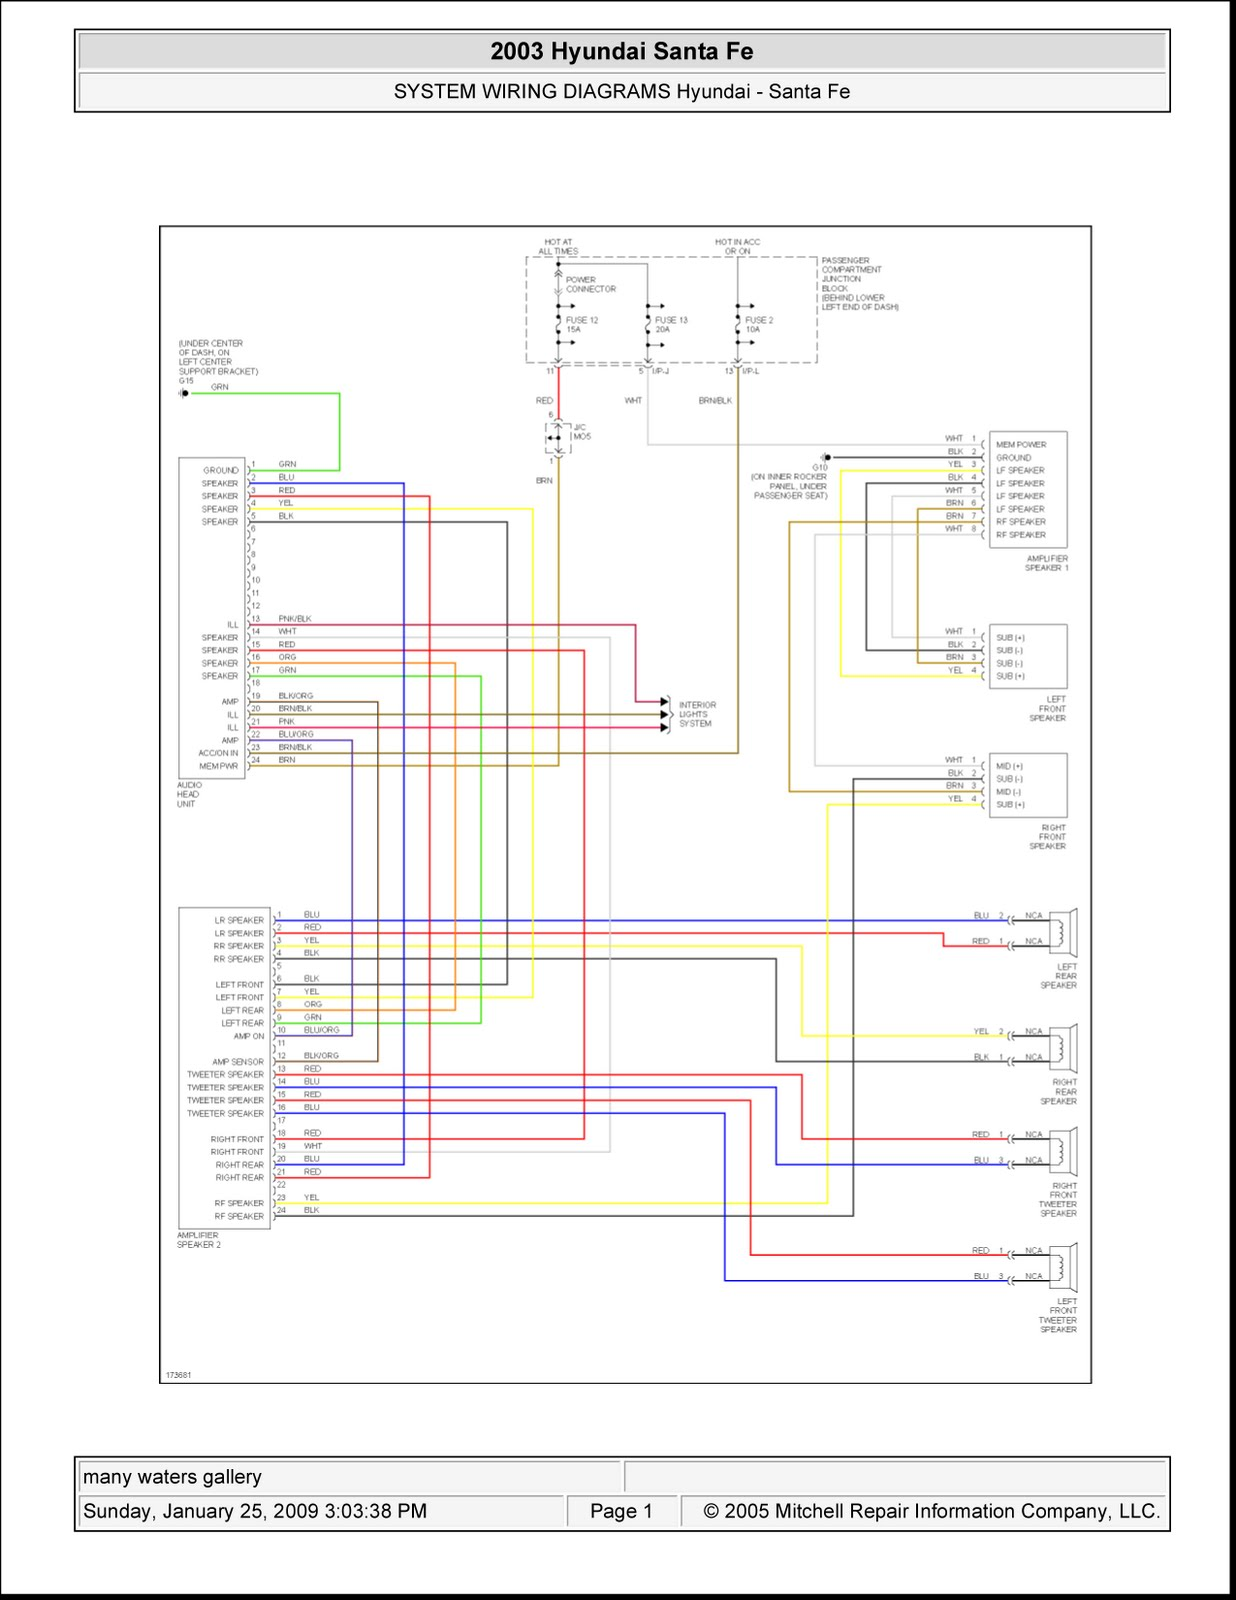 2003 Hyundai Santa Fe | System Wiring Diagrams | Radio